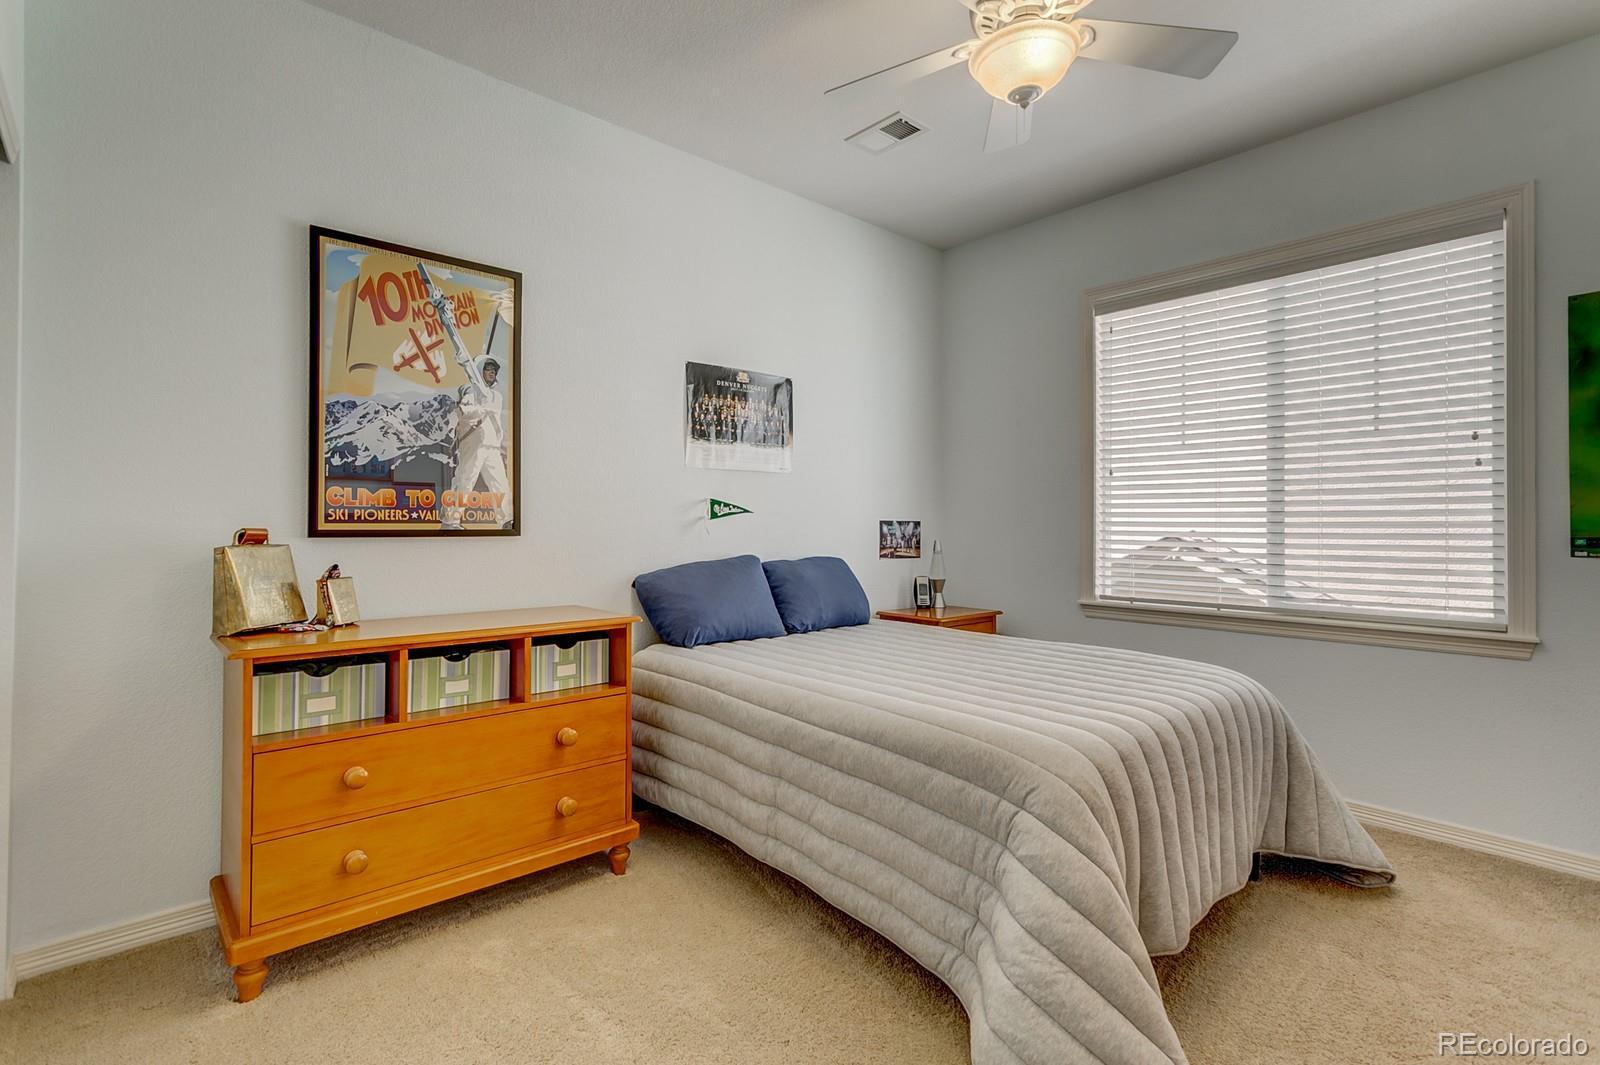 MLS# 6747511 - 19 - 4568 Valleybrook Drive, Highlands Ranch, CO 80130